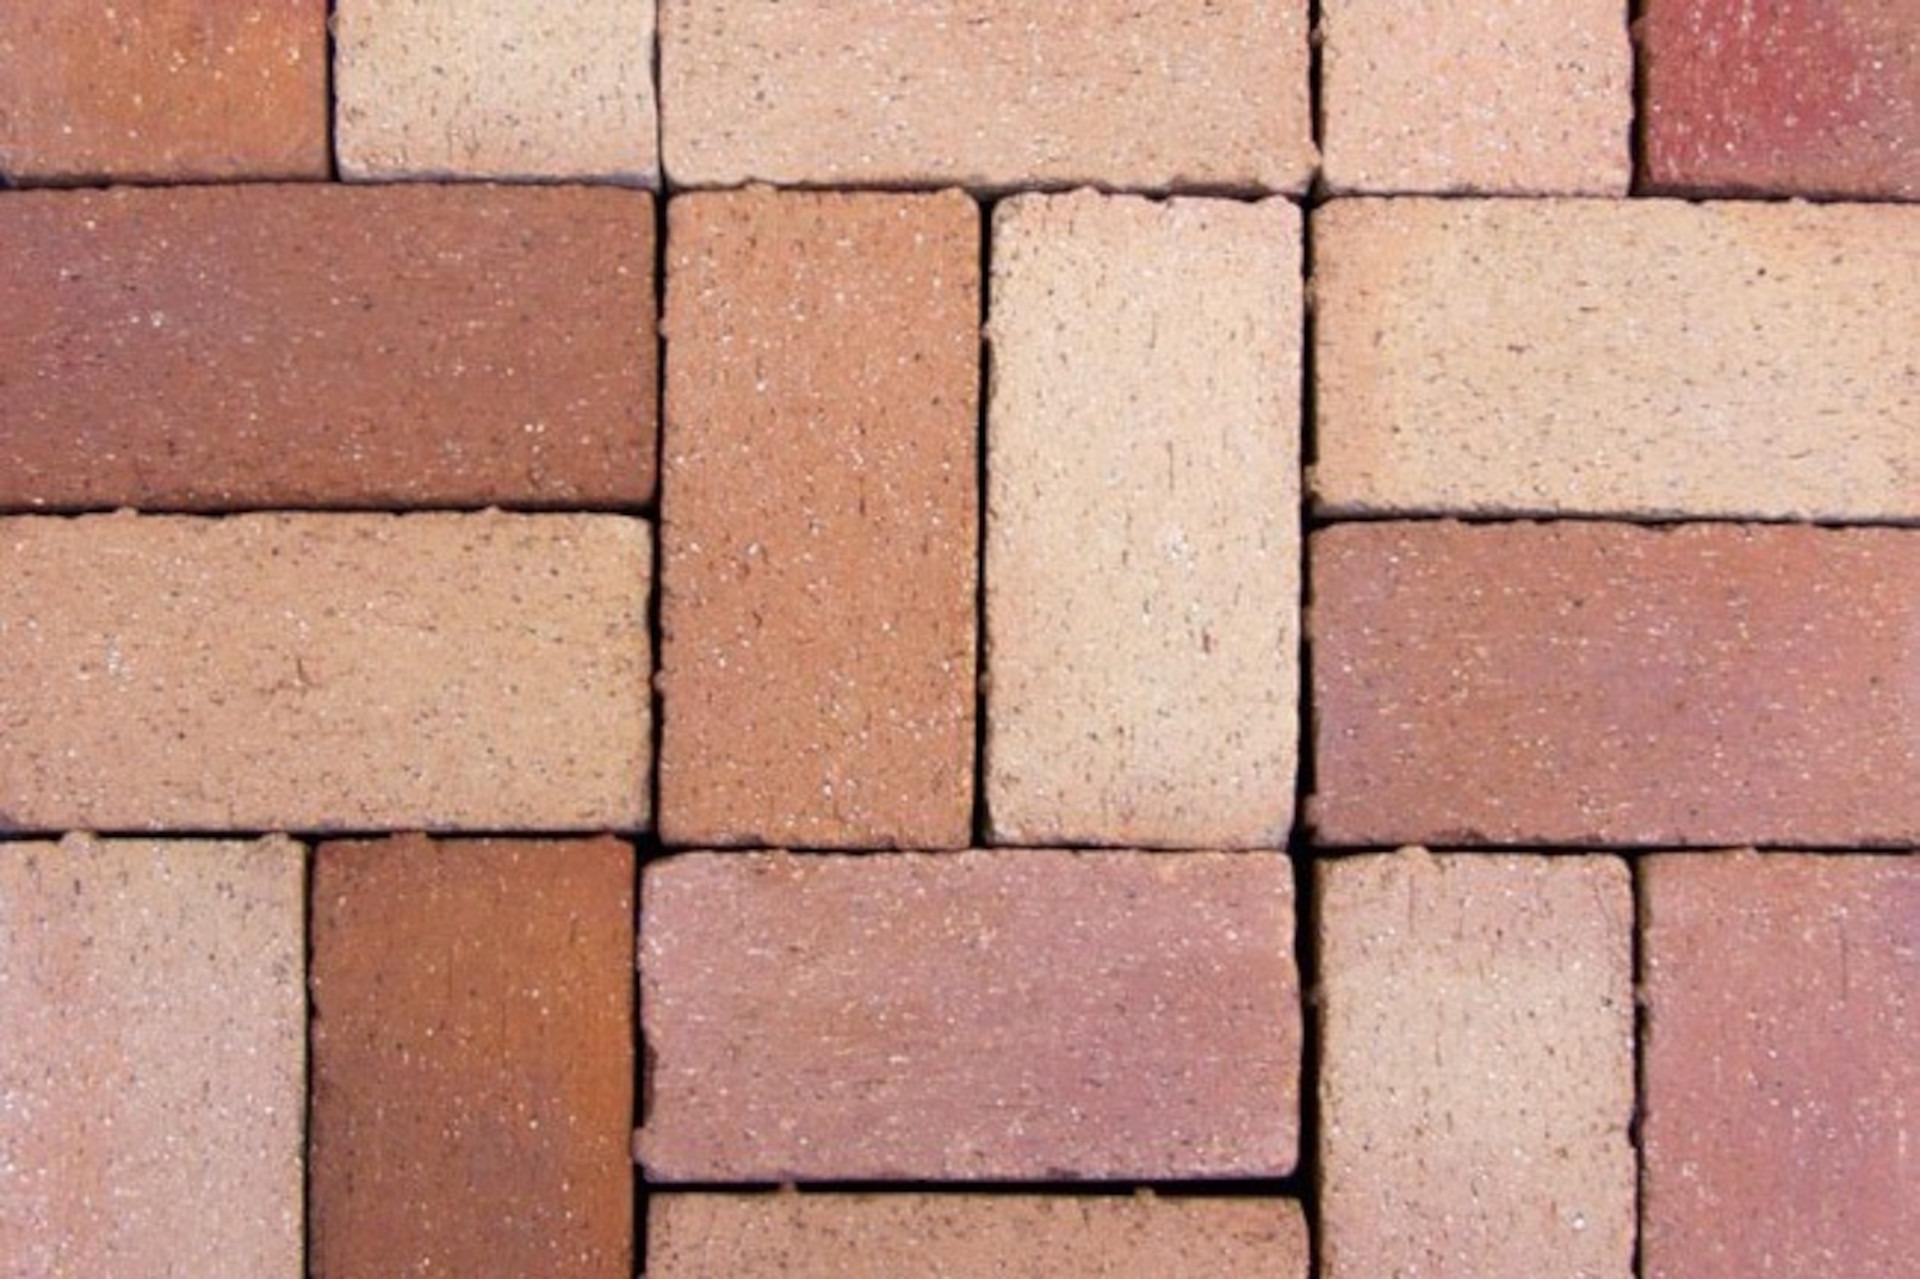 Wheatridge Classic Brick Pavers